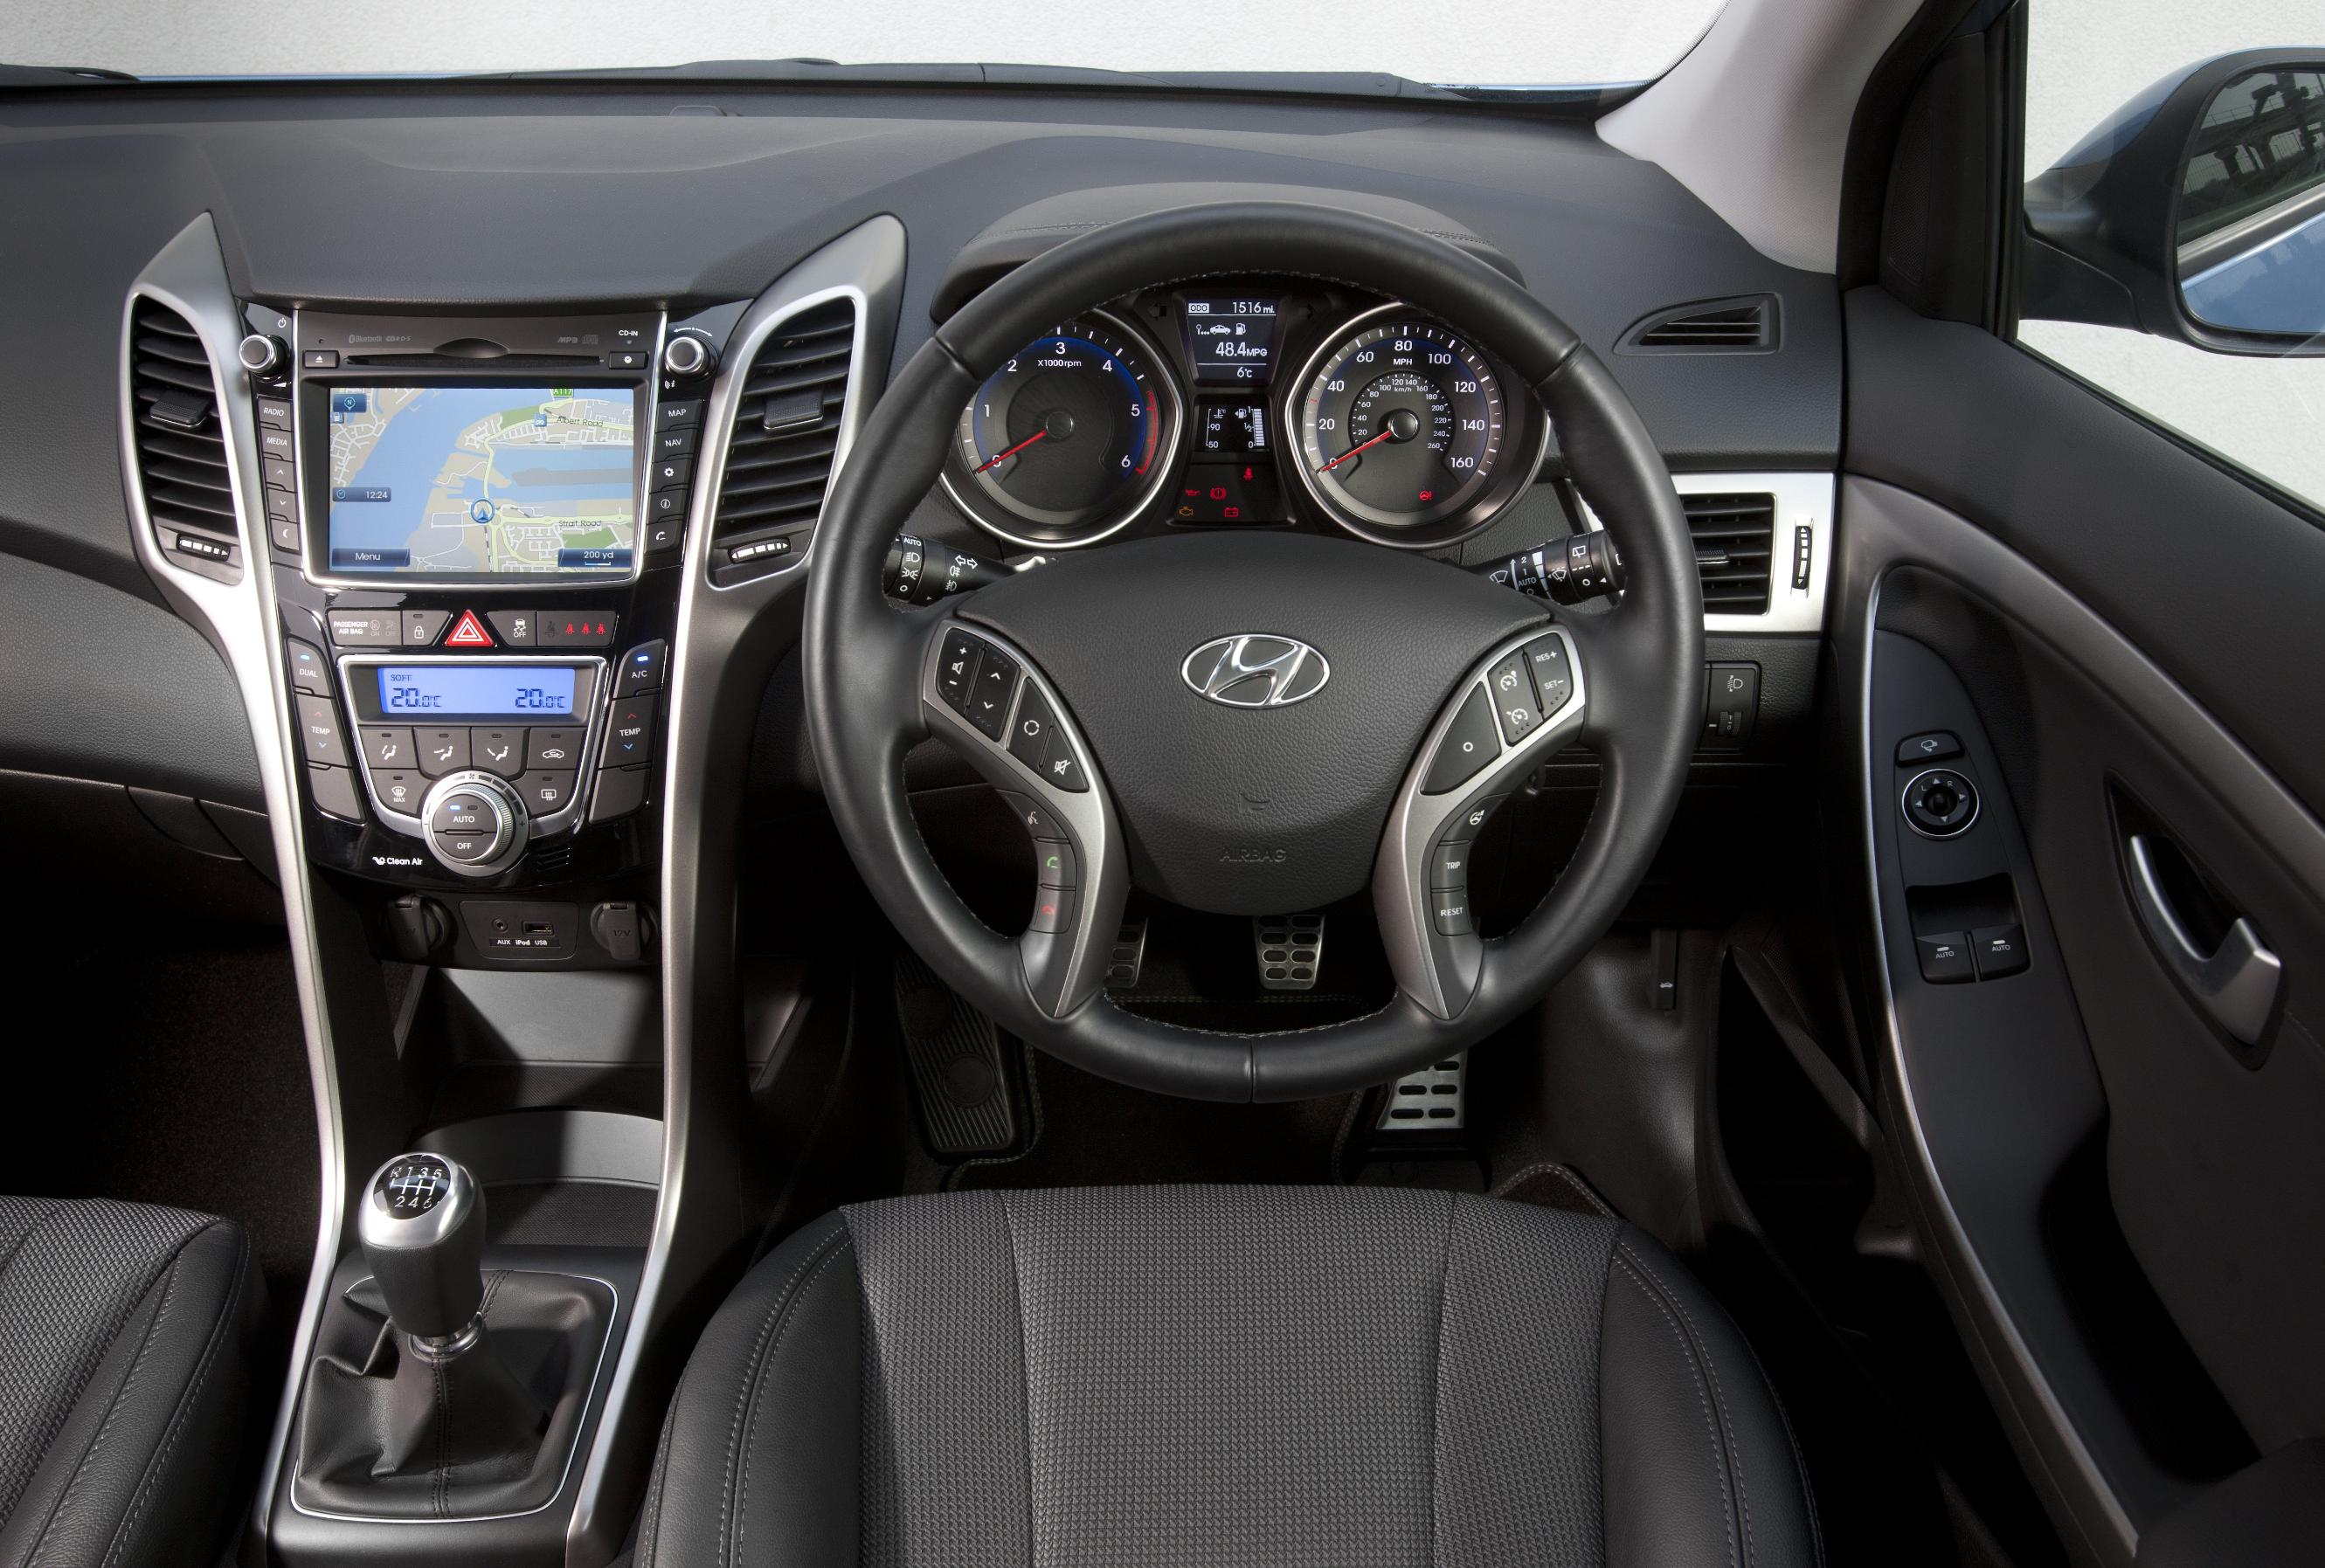 hyundai i30 interior - india car news